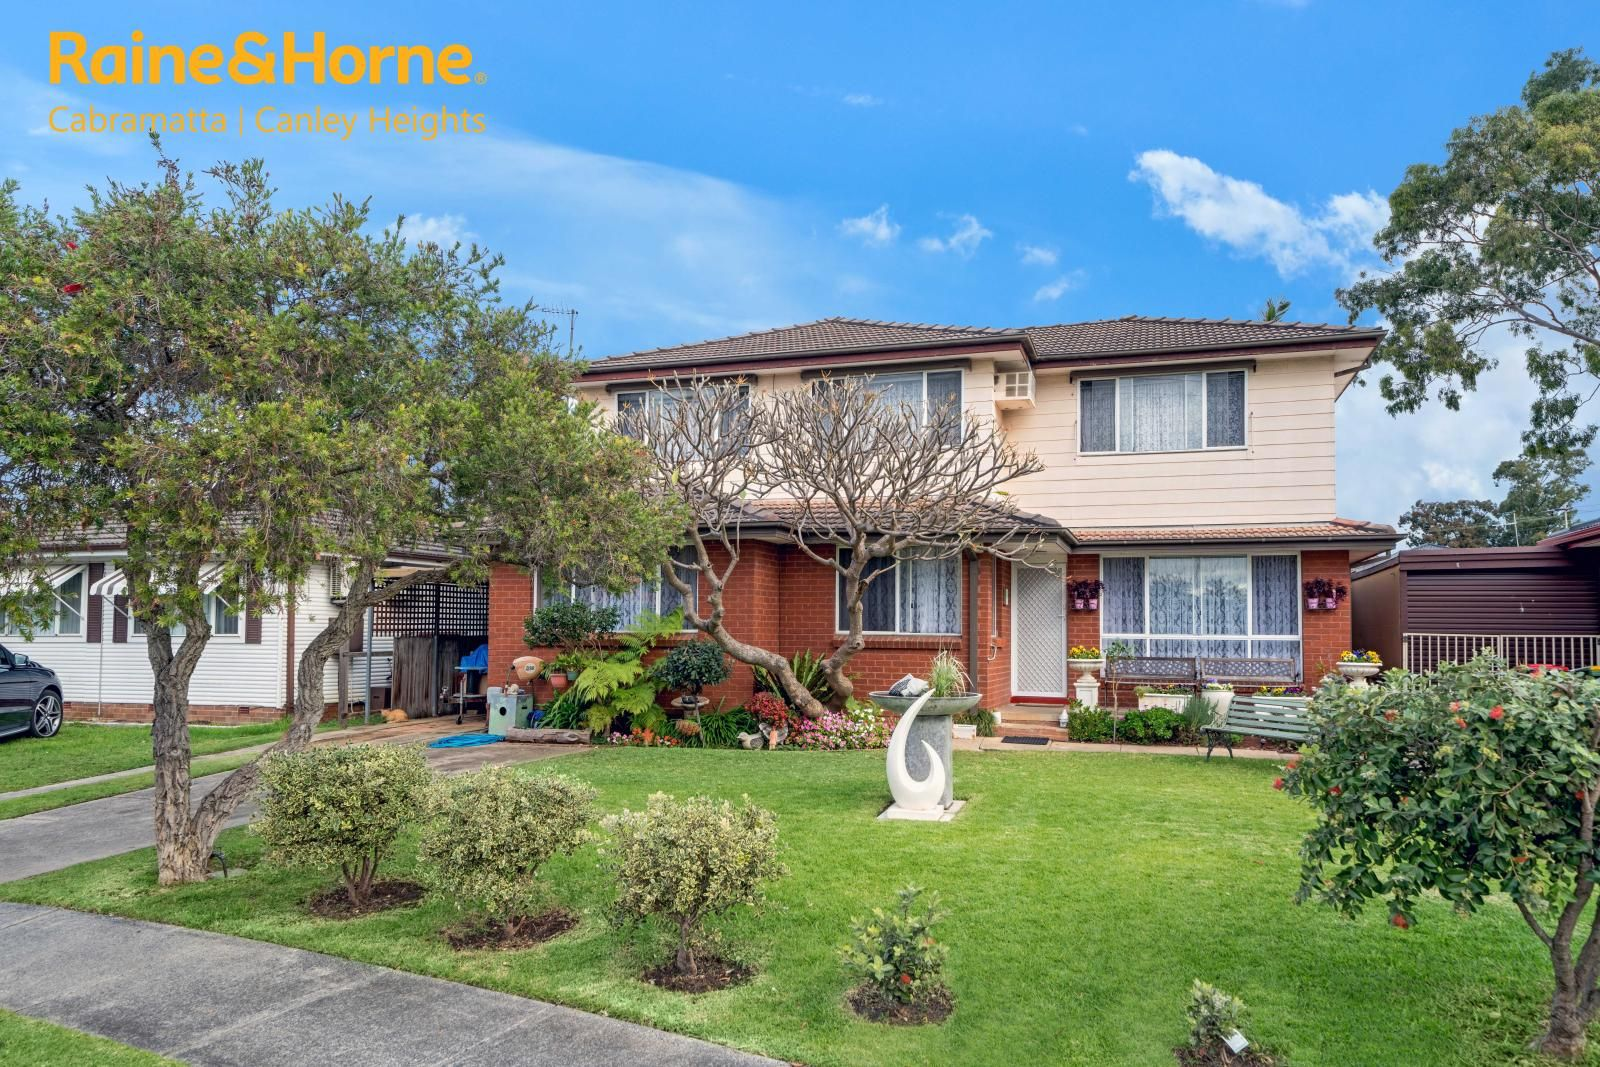 3 KAROON AVENUE, Canley Heights NSW 2166, Image 0